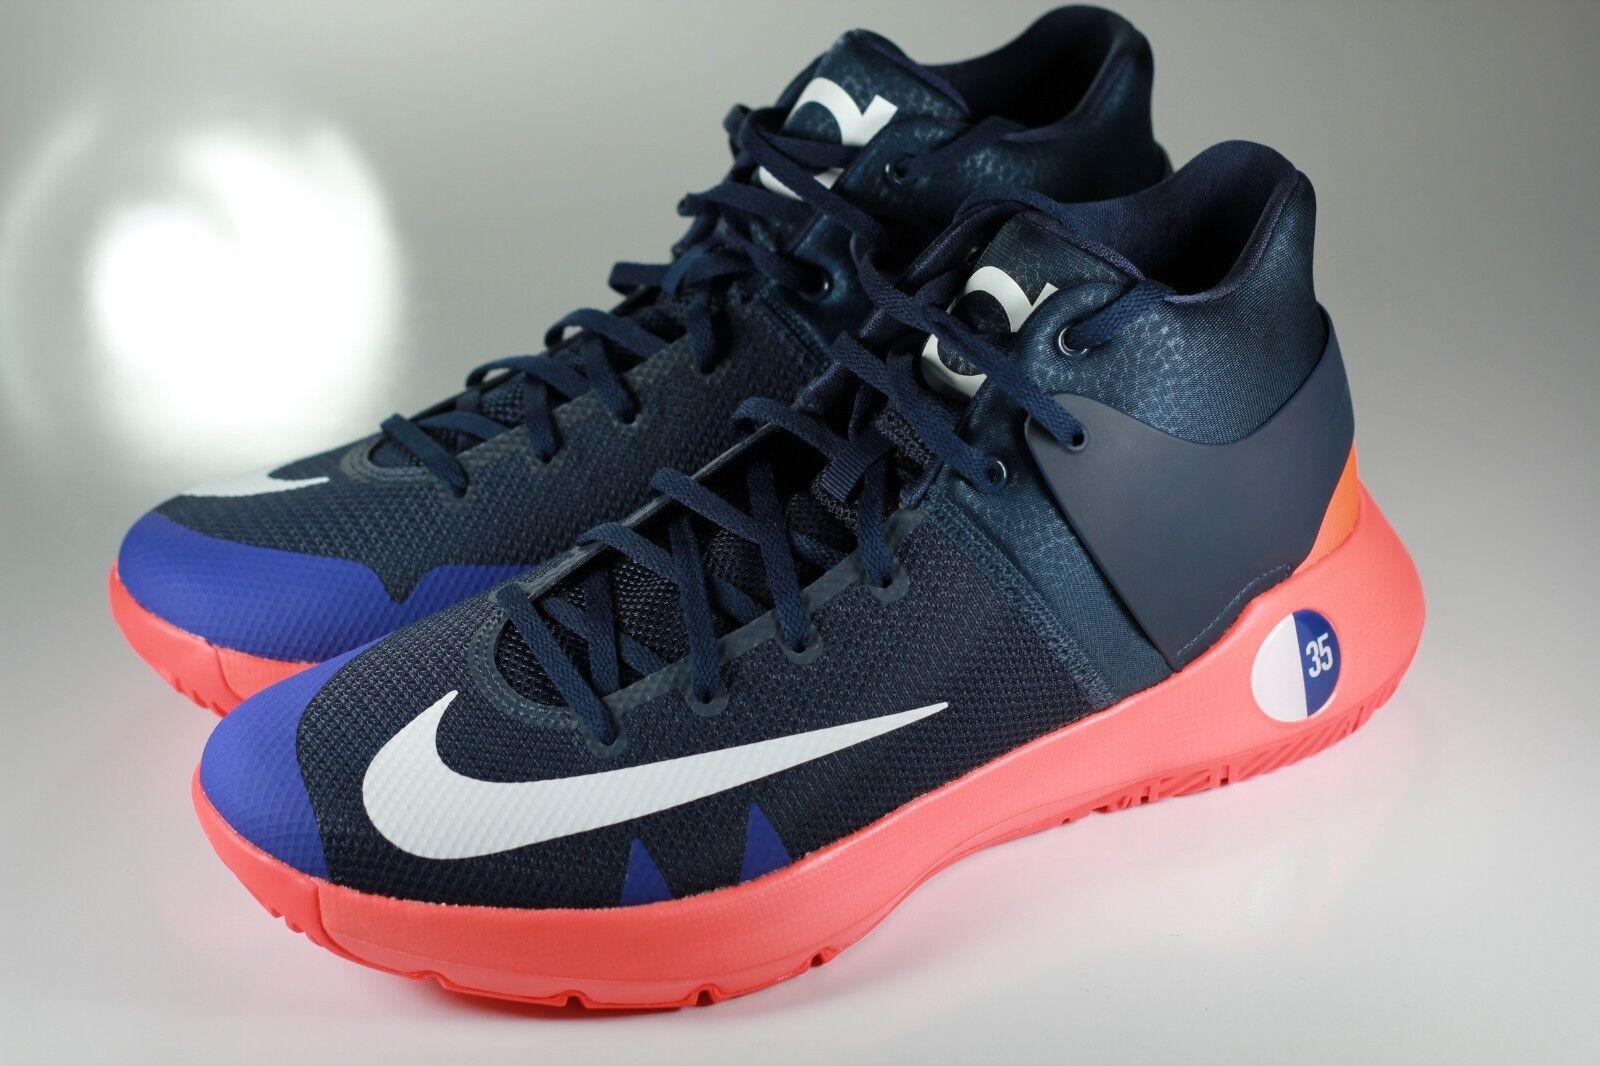 6d5d0047bd5 Nike KD Trey 5 IV 844571-416 844571-416 844571-416 Size 12 - Awesome ...